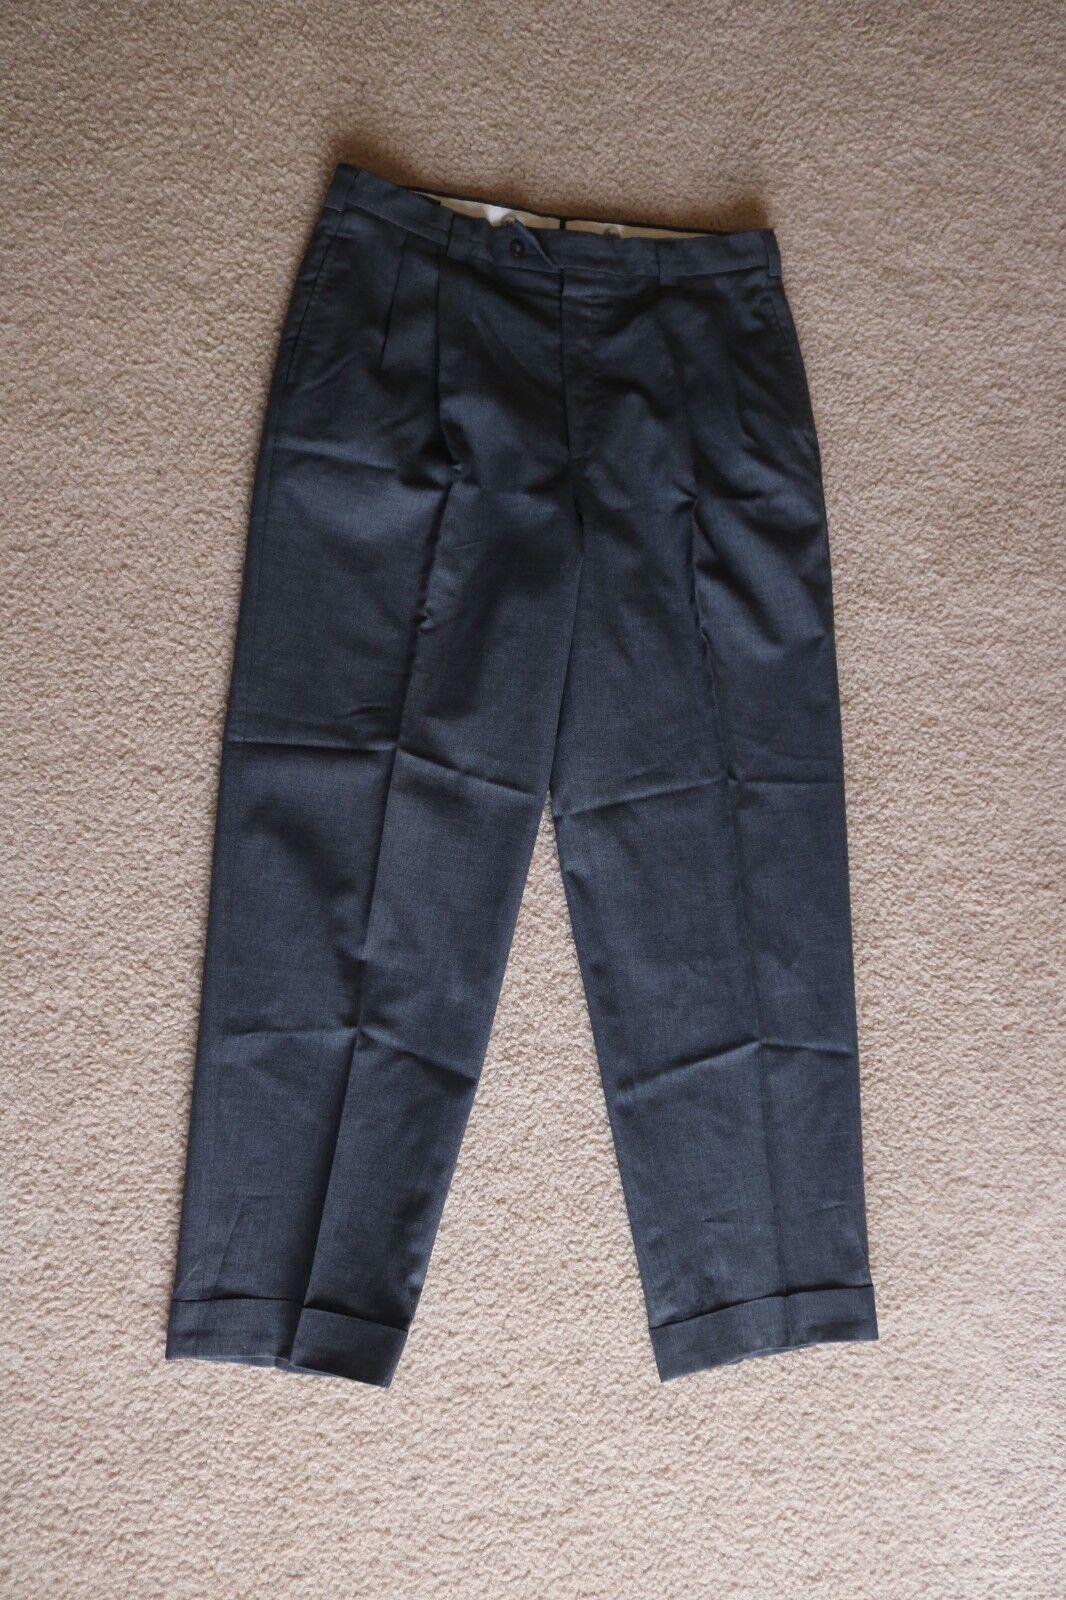 Alexander Julian Men's Flat Front Dress Pants 100% Wool Grey